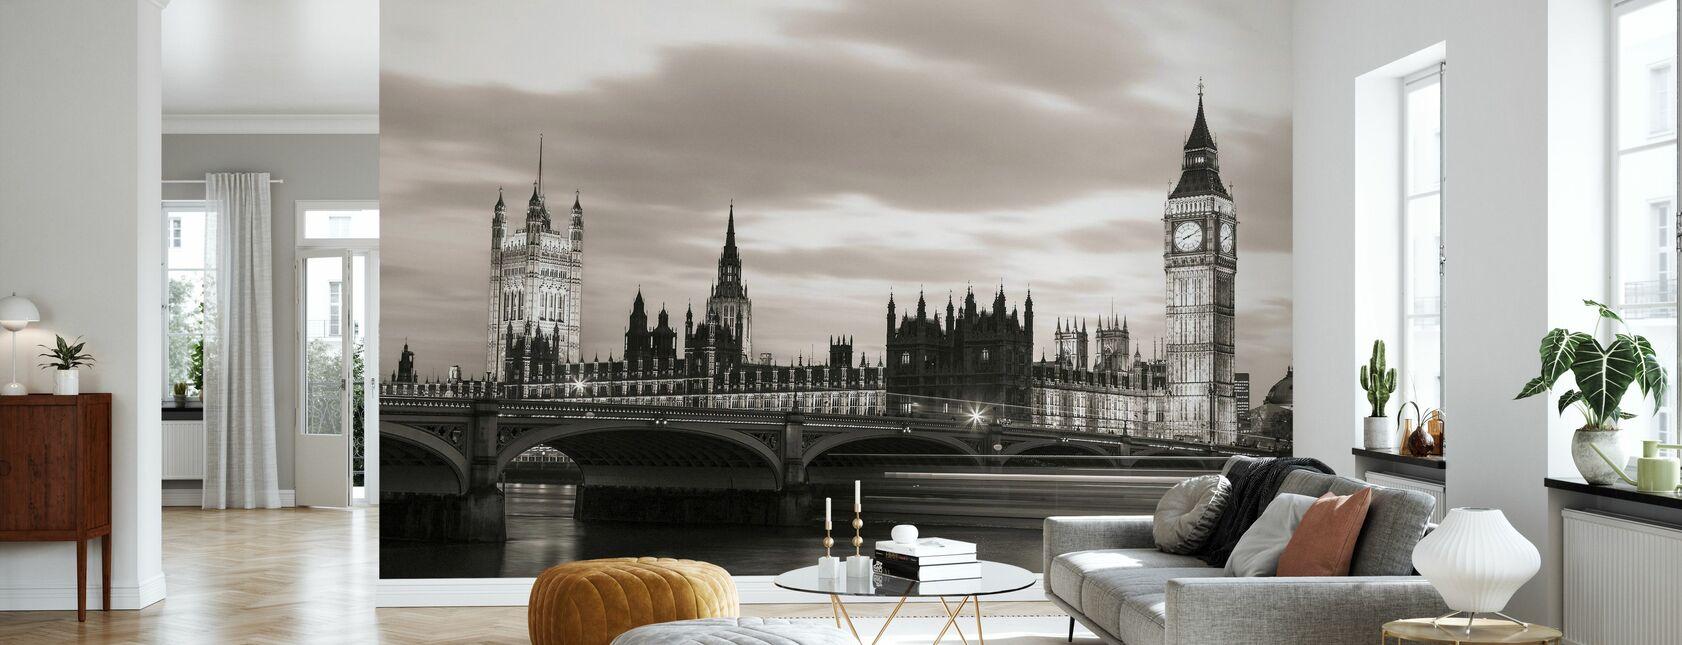 London Westminster - Sepia - Wallpaper - Living Room